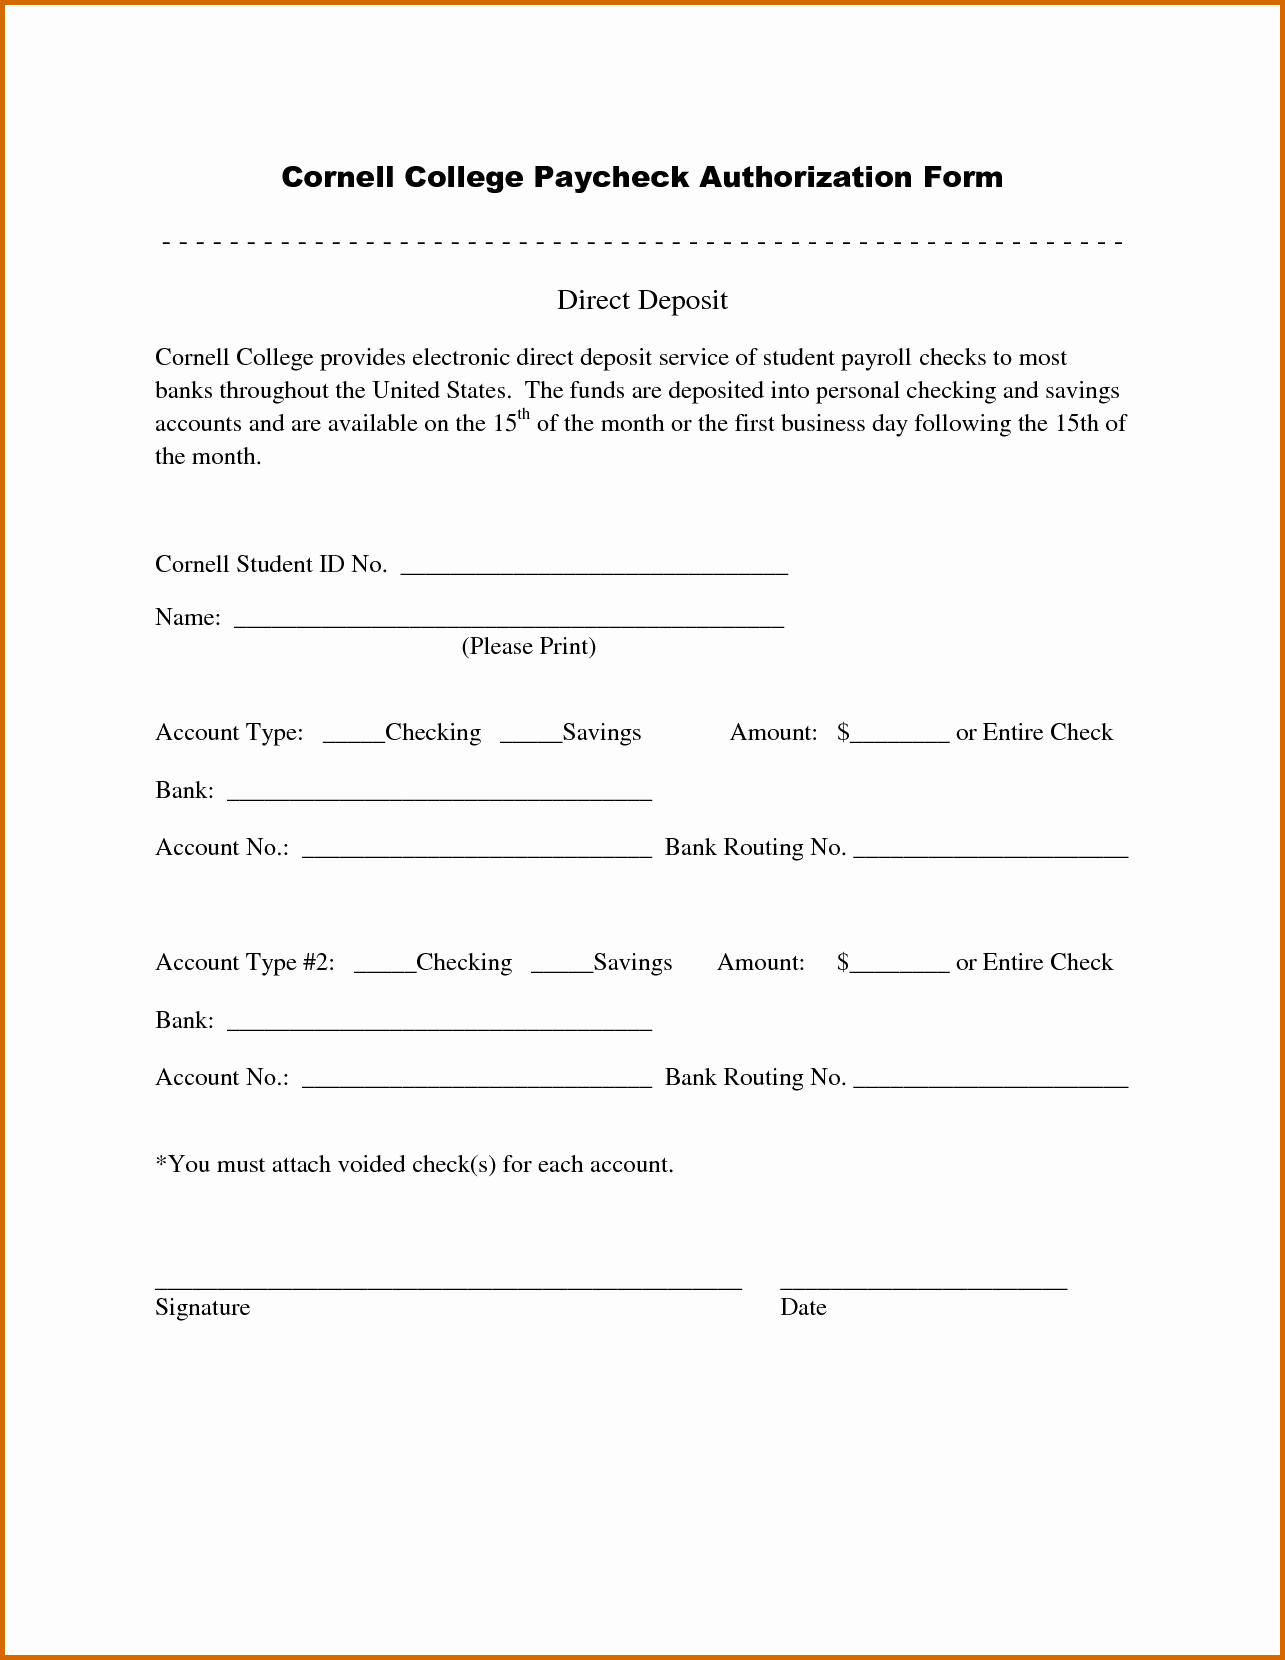 Direct Deposit Authorization form Template Elegant 12 Sample Direct Deposit Authorization form